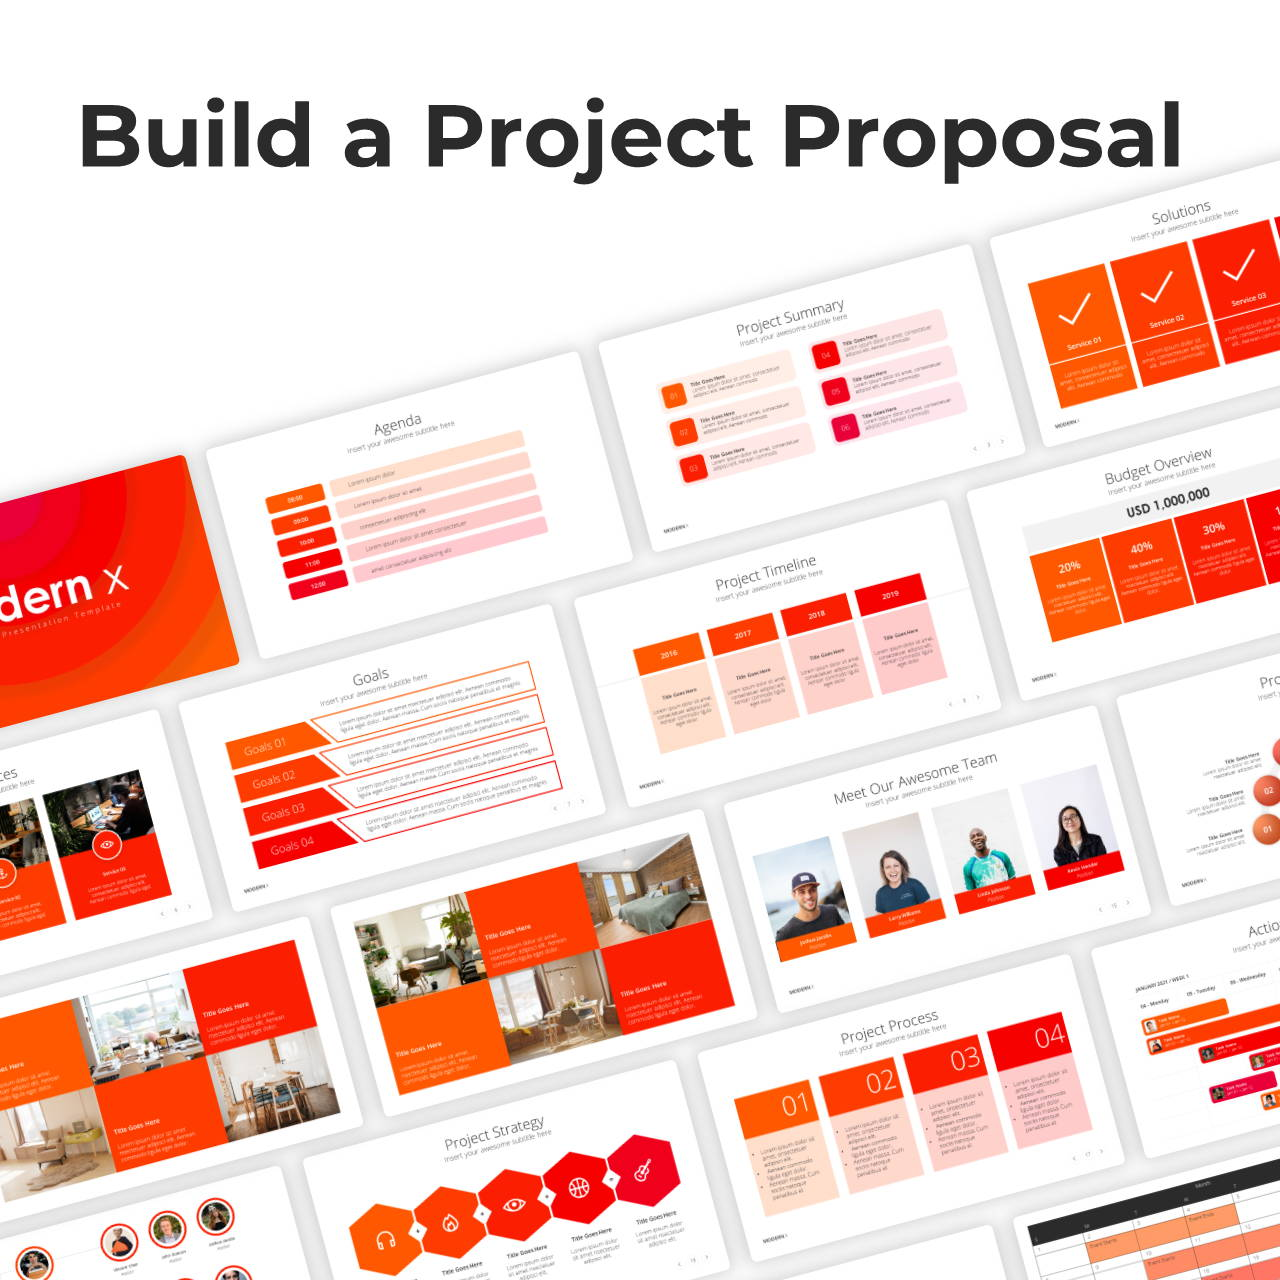 Modern X Project Proposal Presentation Template